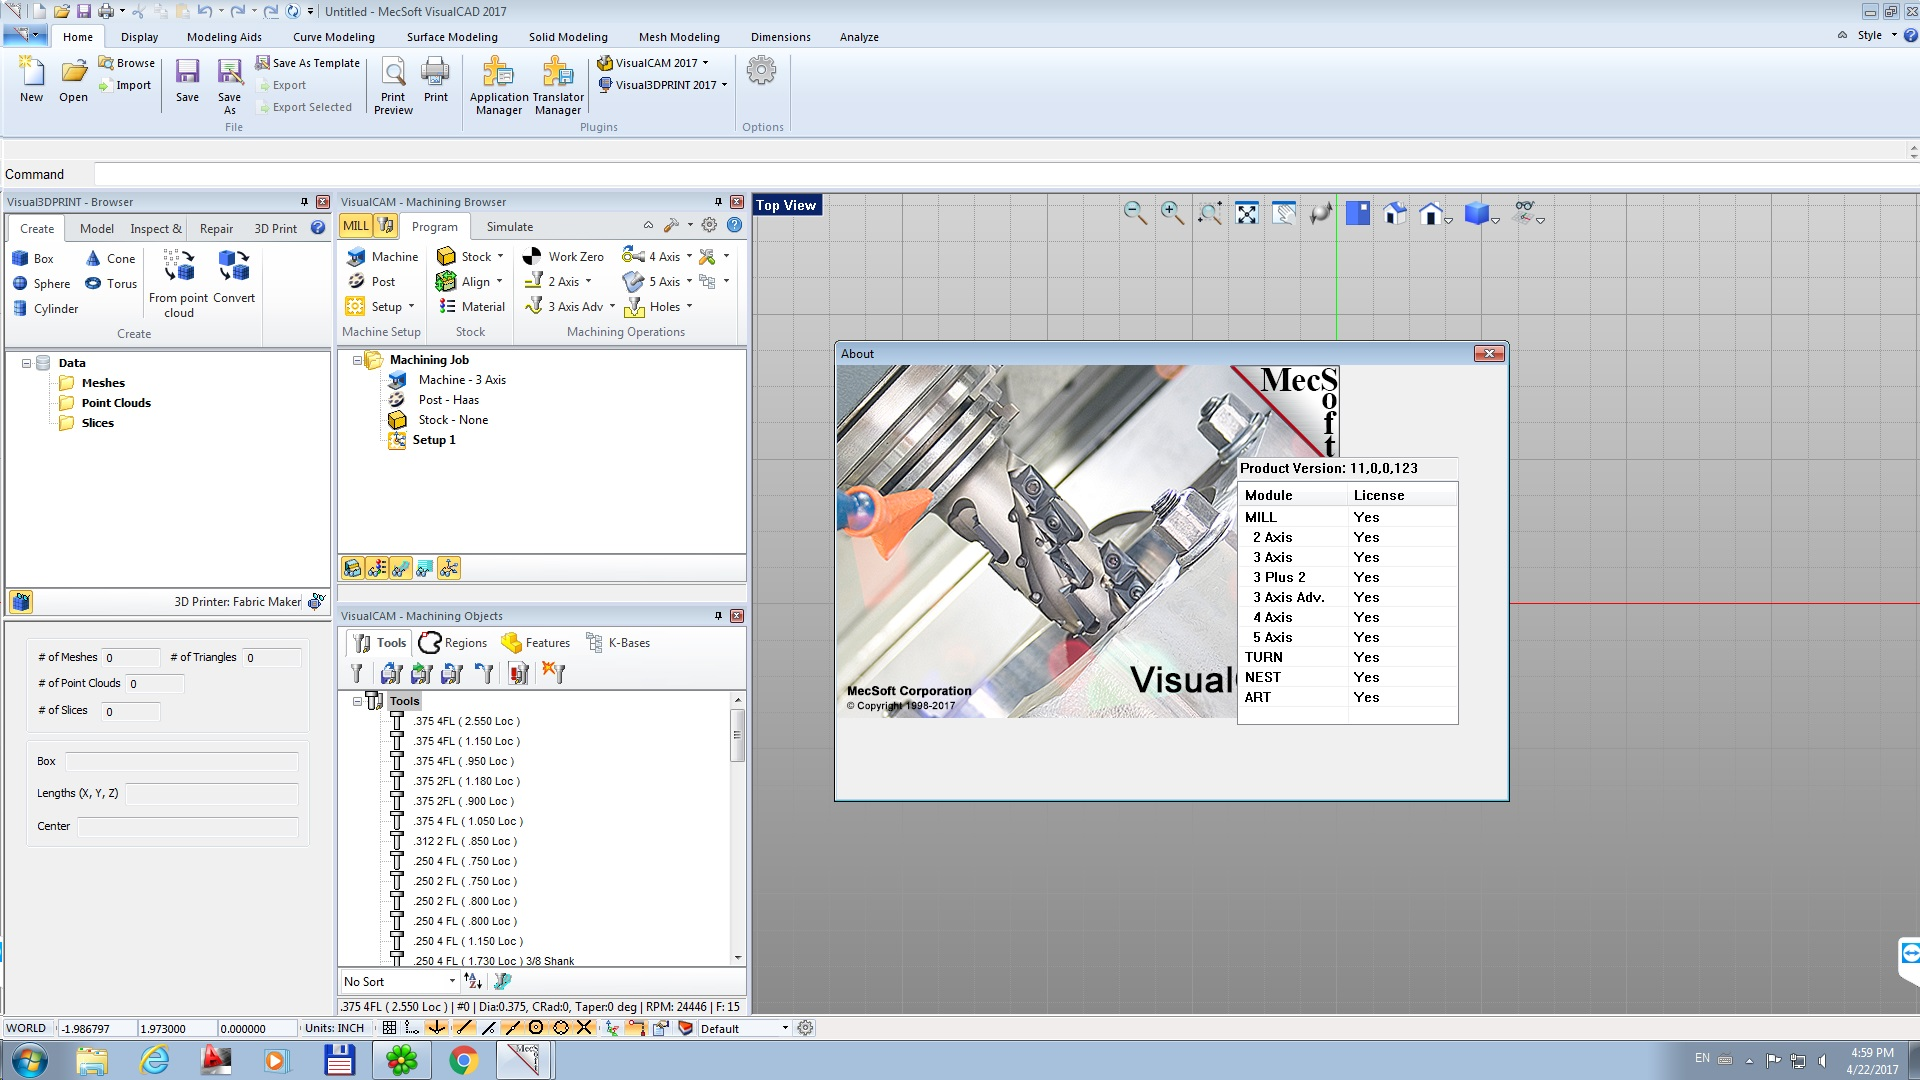 Working with MecSoft VisualCADCAM 2017 v6.0.413 full